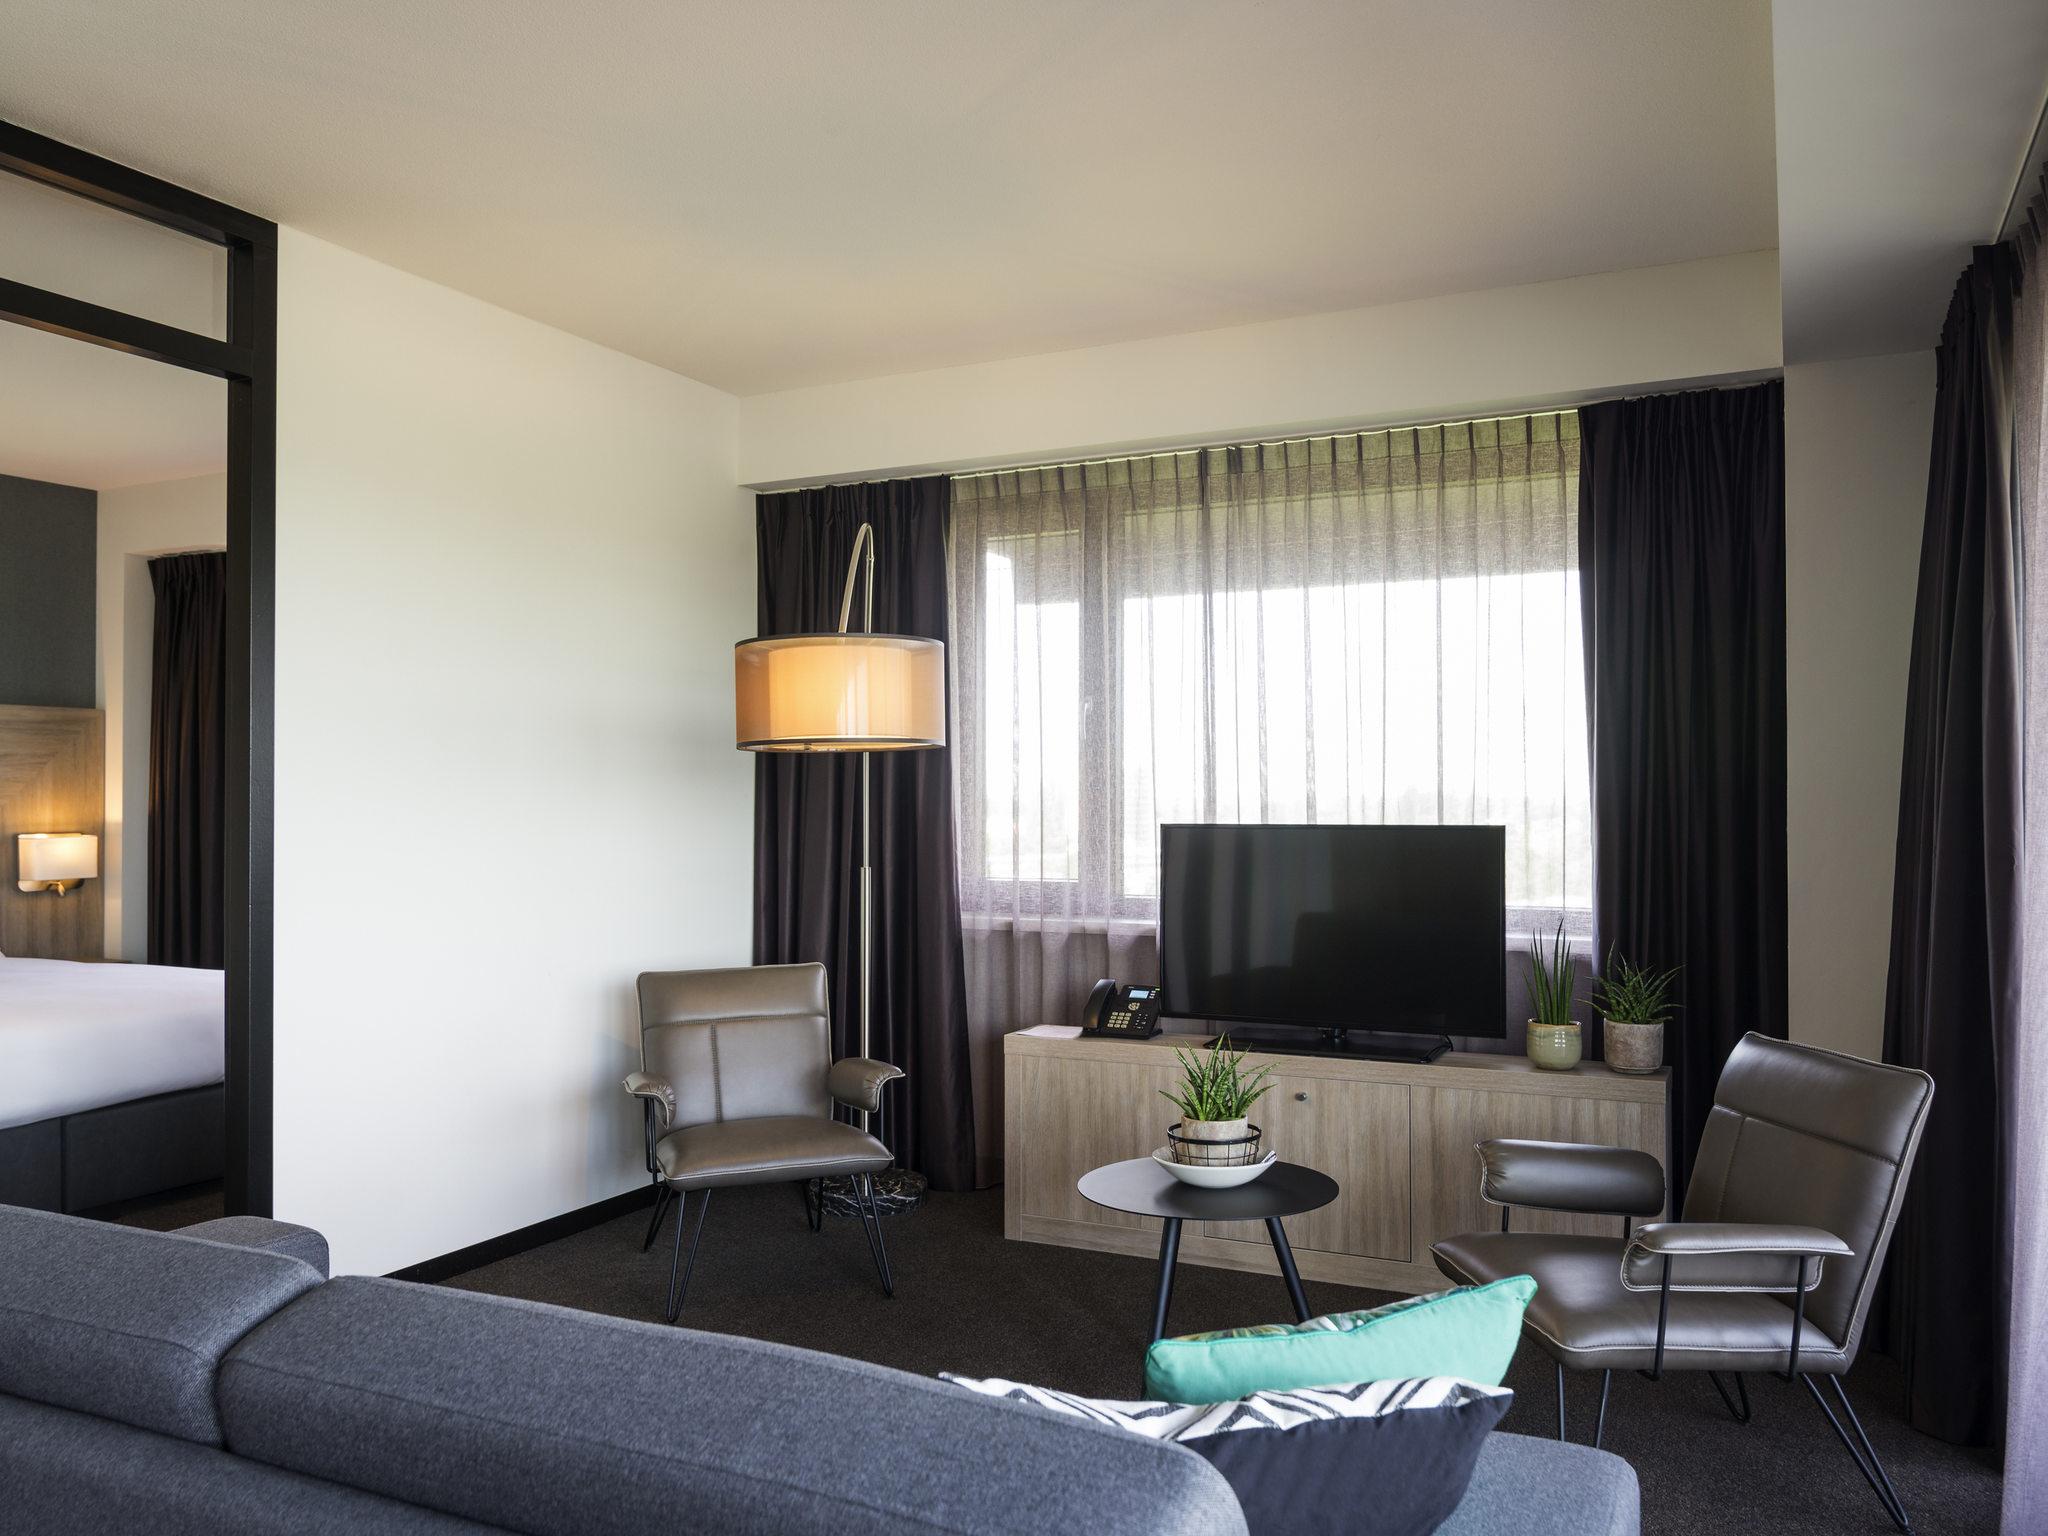 Hotel a amstelveen aparthotel adagio amsterdam city south for Aparthotel amsterdam